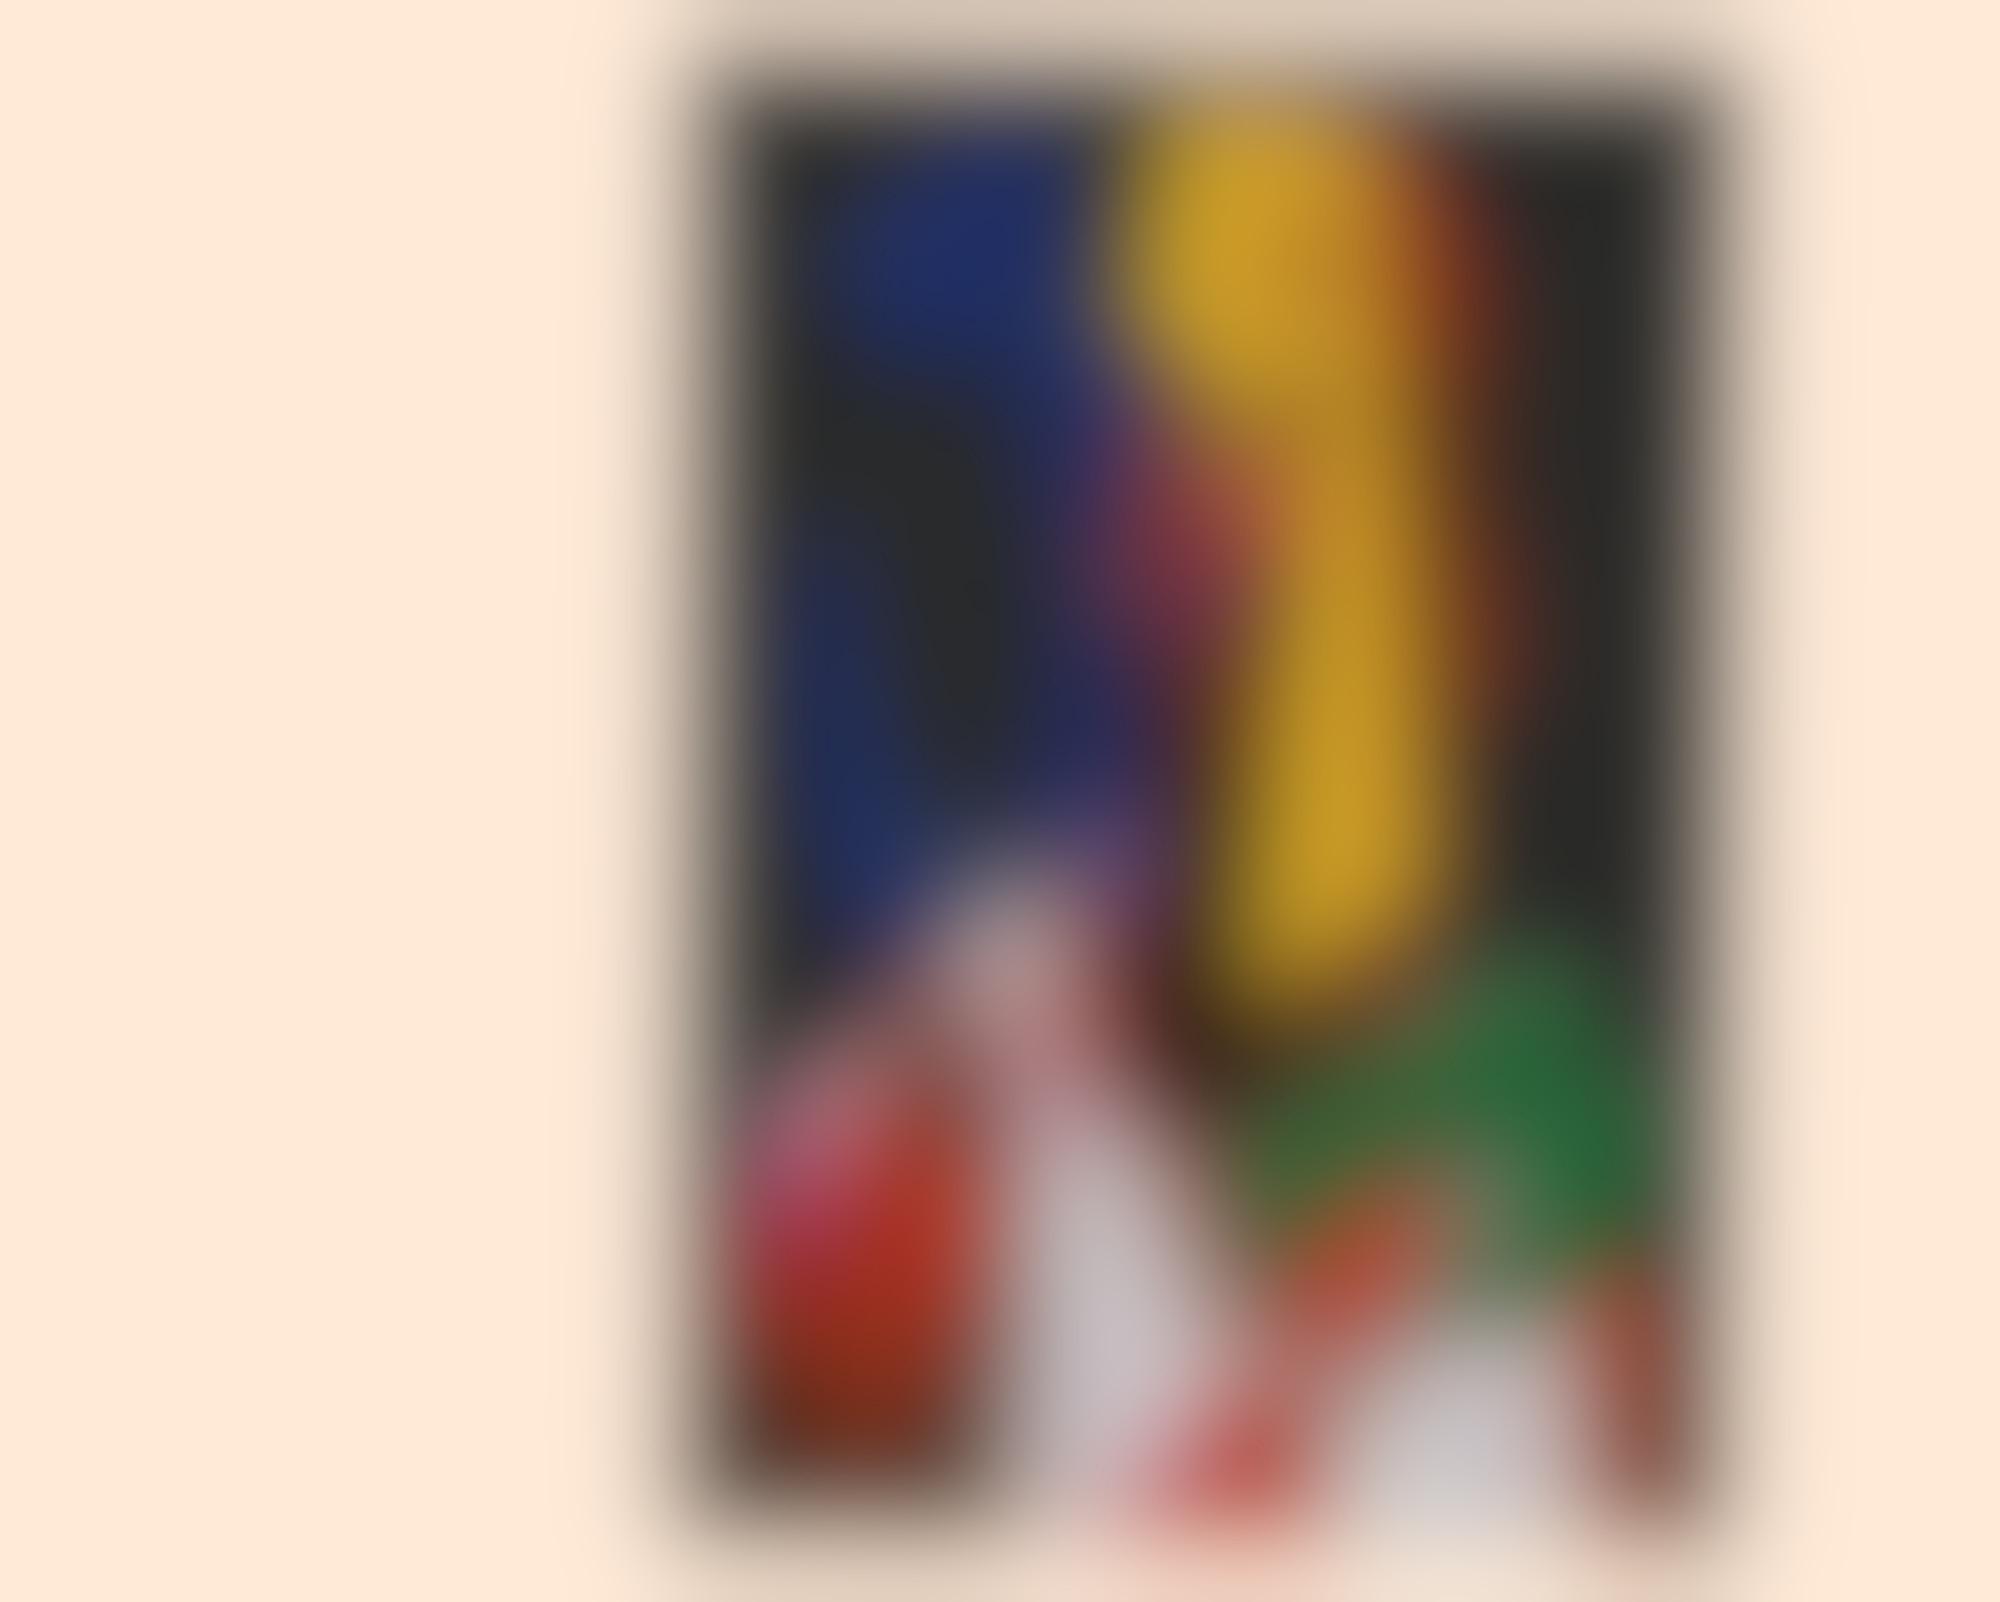 Lecture in progress sheyi adebayo graphic design 13 autocompressfitresizeixlibphp 1 1 0max h2000max w3 D2000q80s1f8f21dfb8aa0b63c7572b59df9b97f8